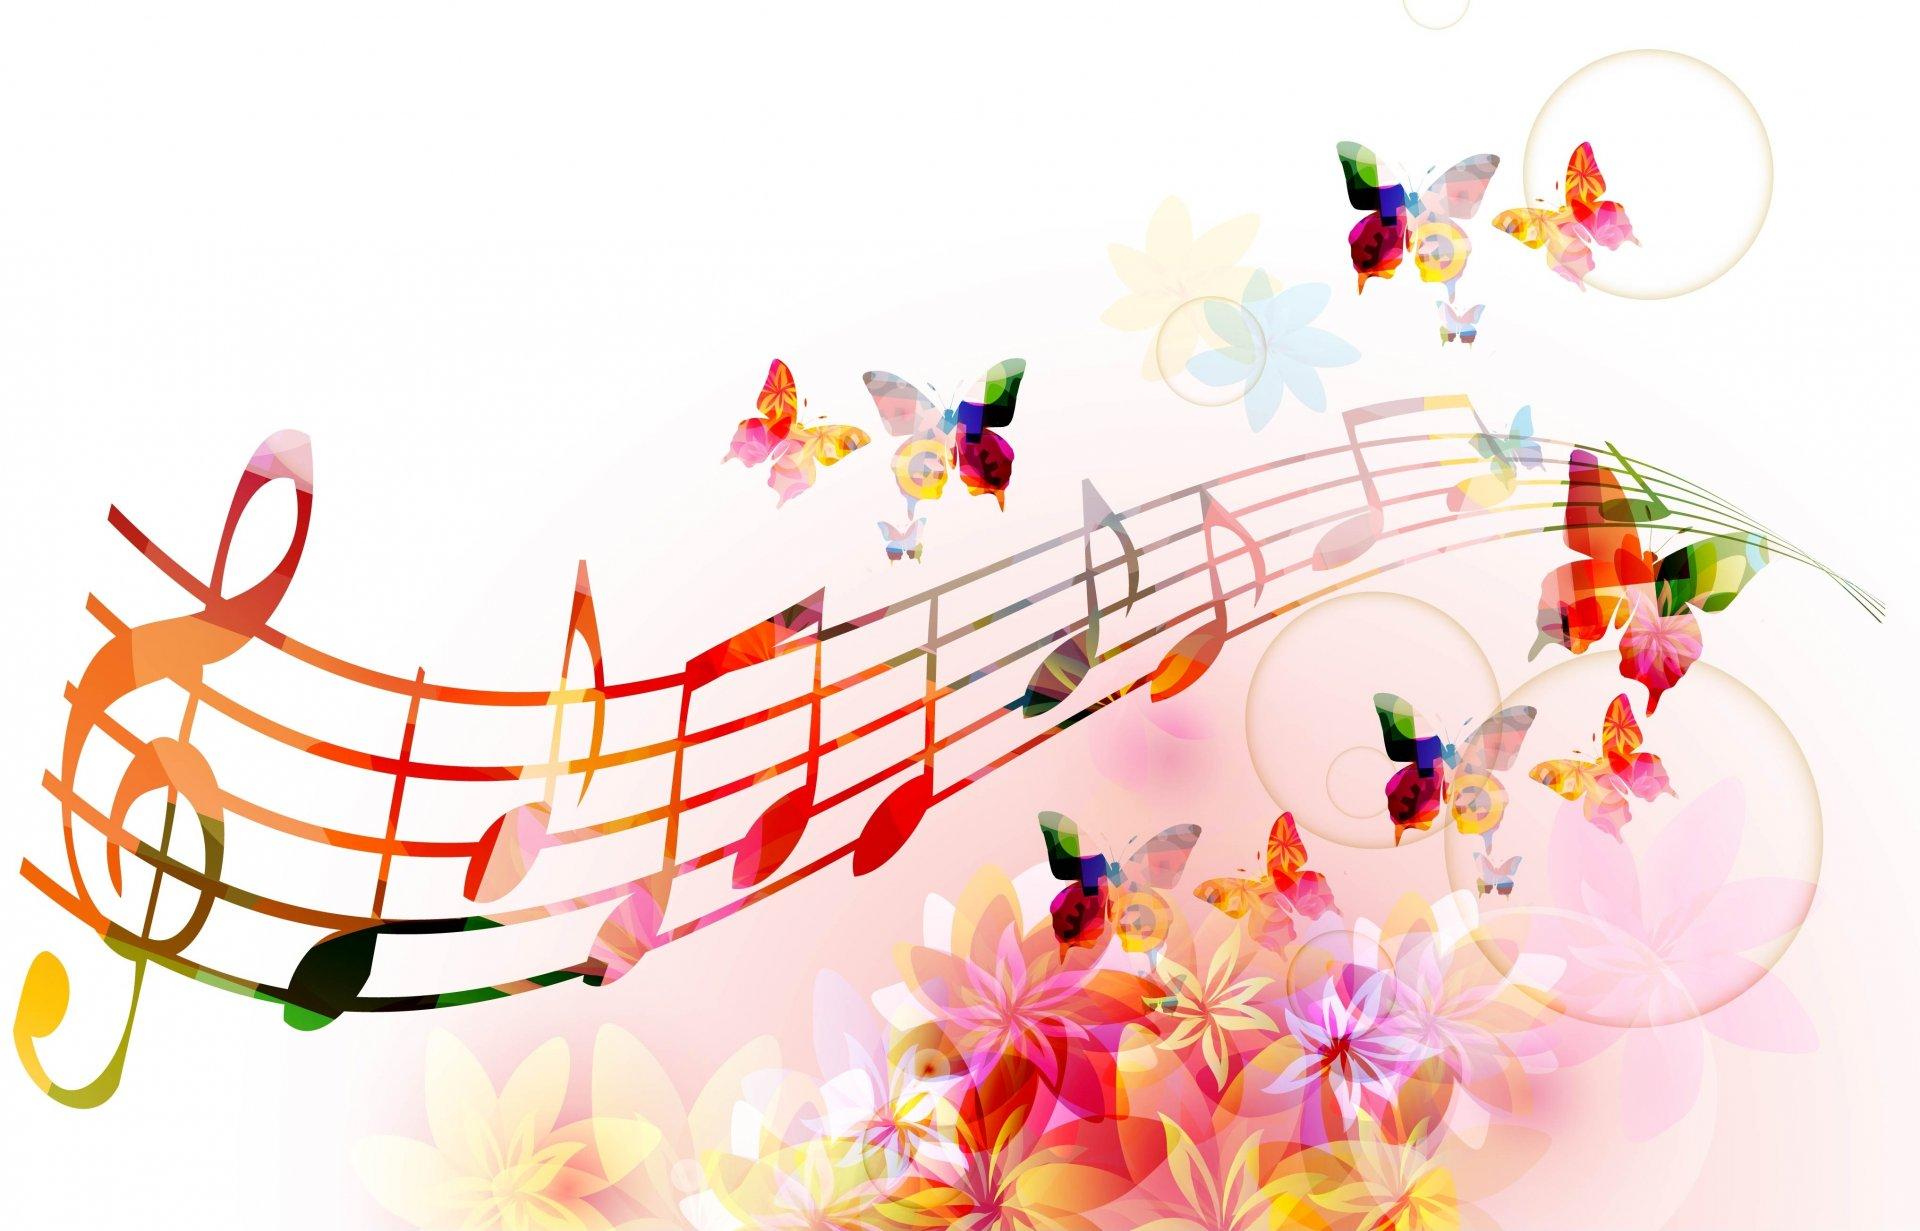 Картинки для презентаций о музыке